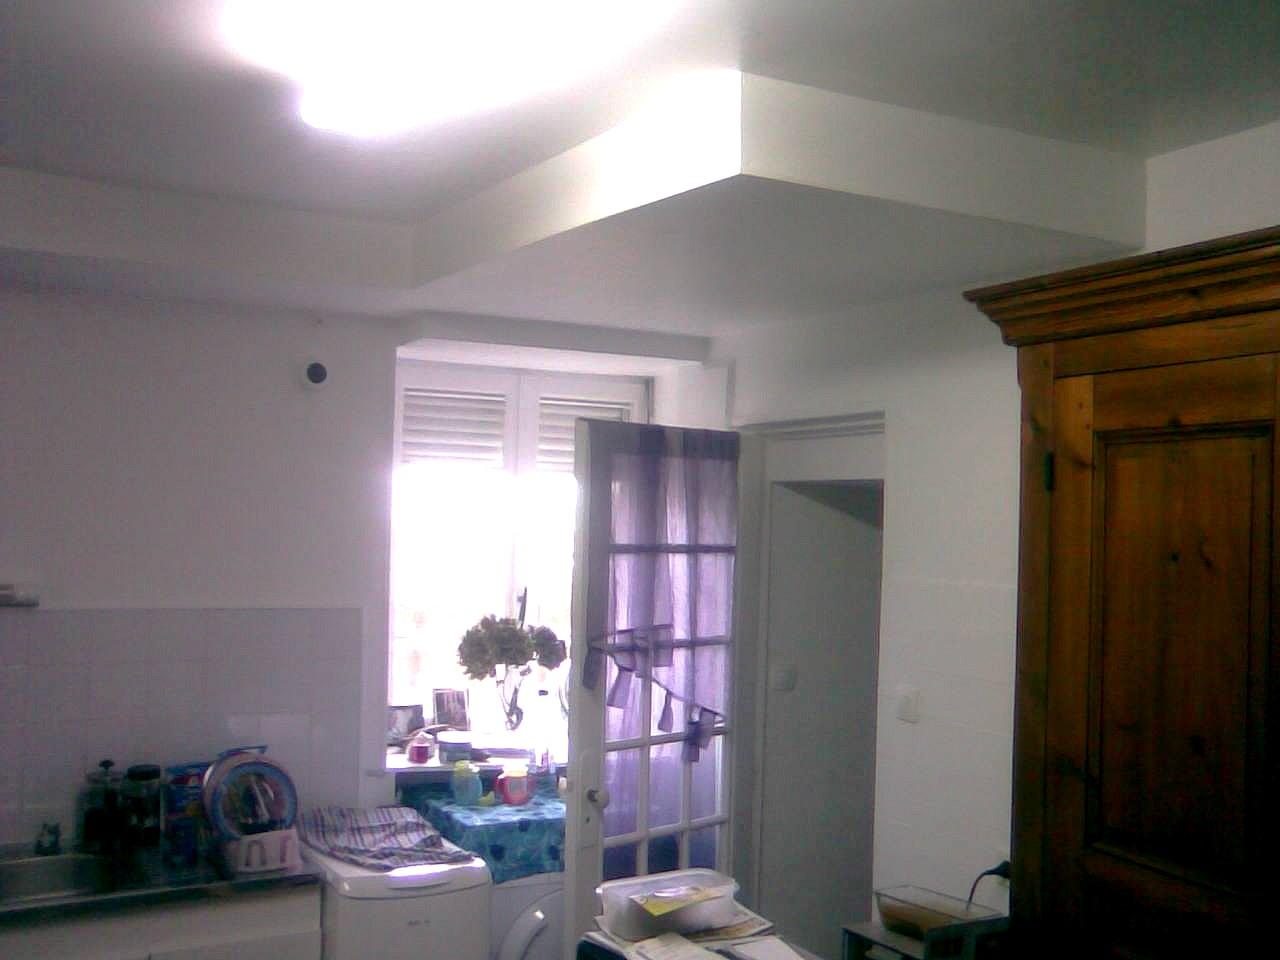 macif illusion d 39 assurance. Black Bedroom Furniture Sets. Home Design Ideas